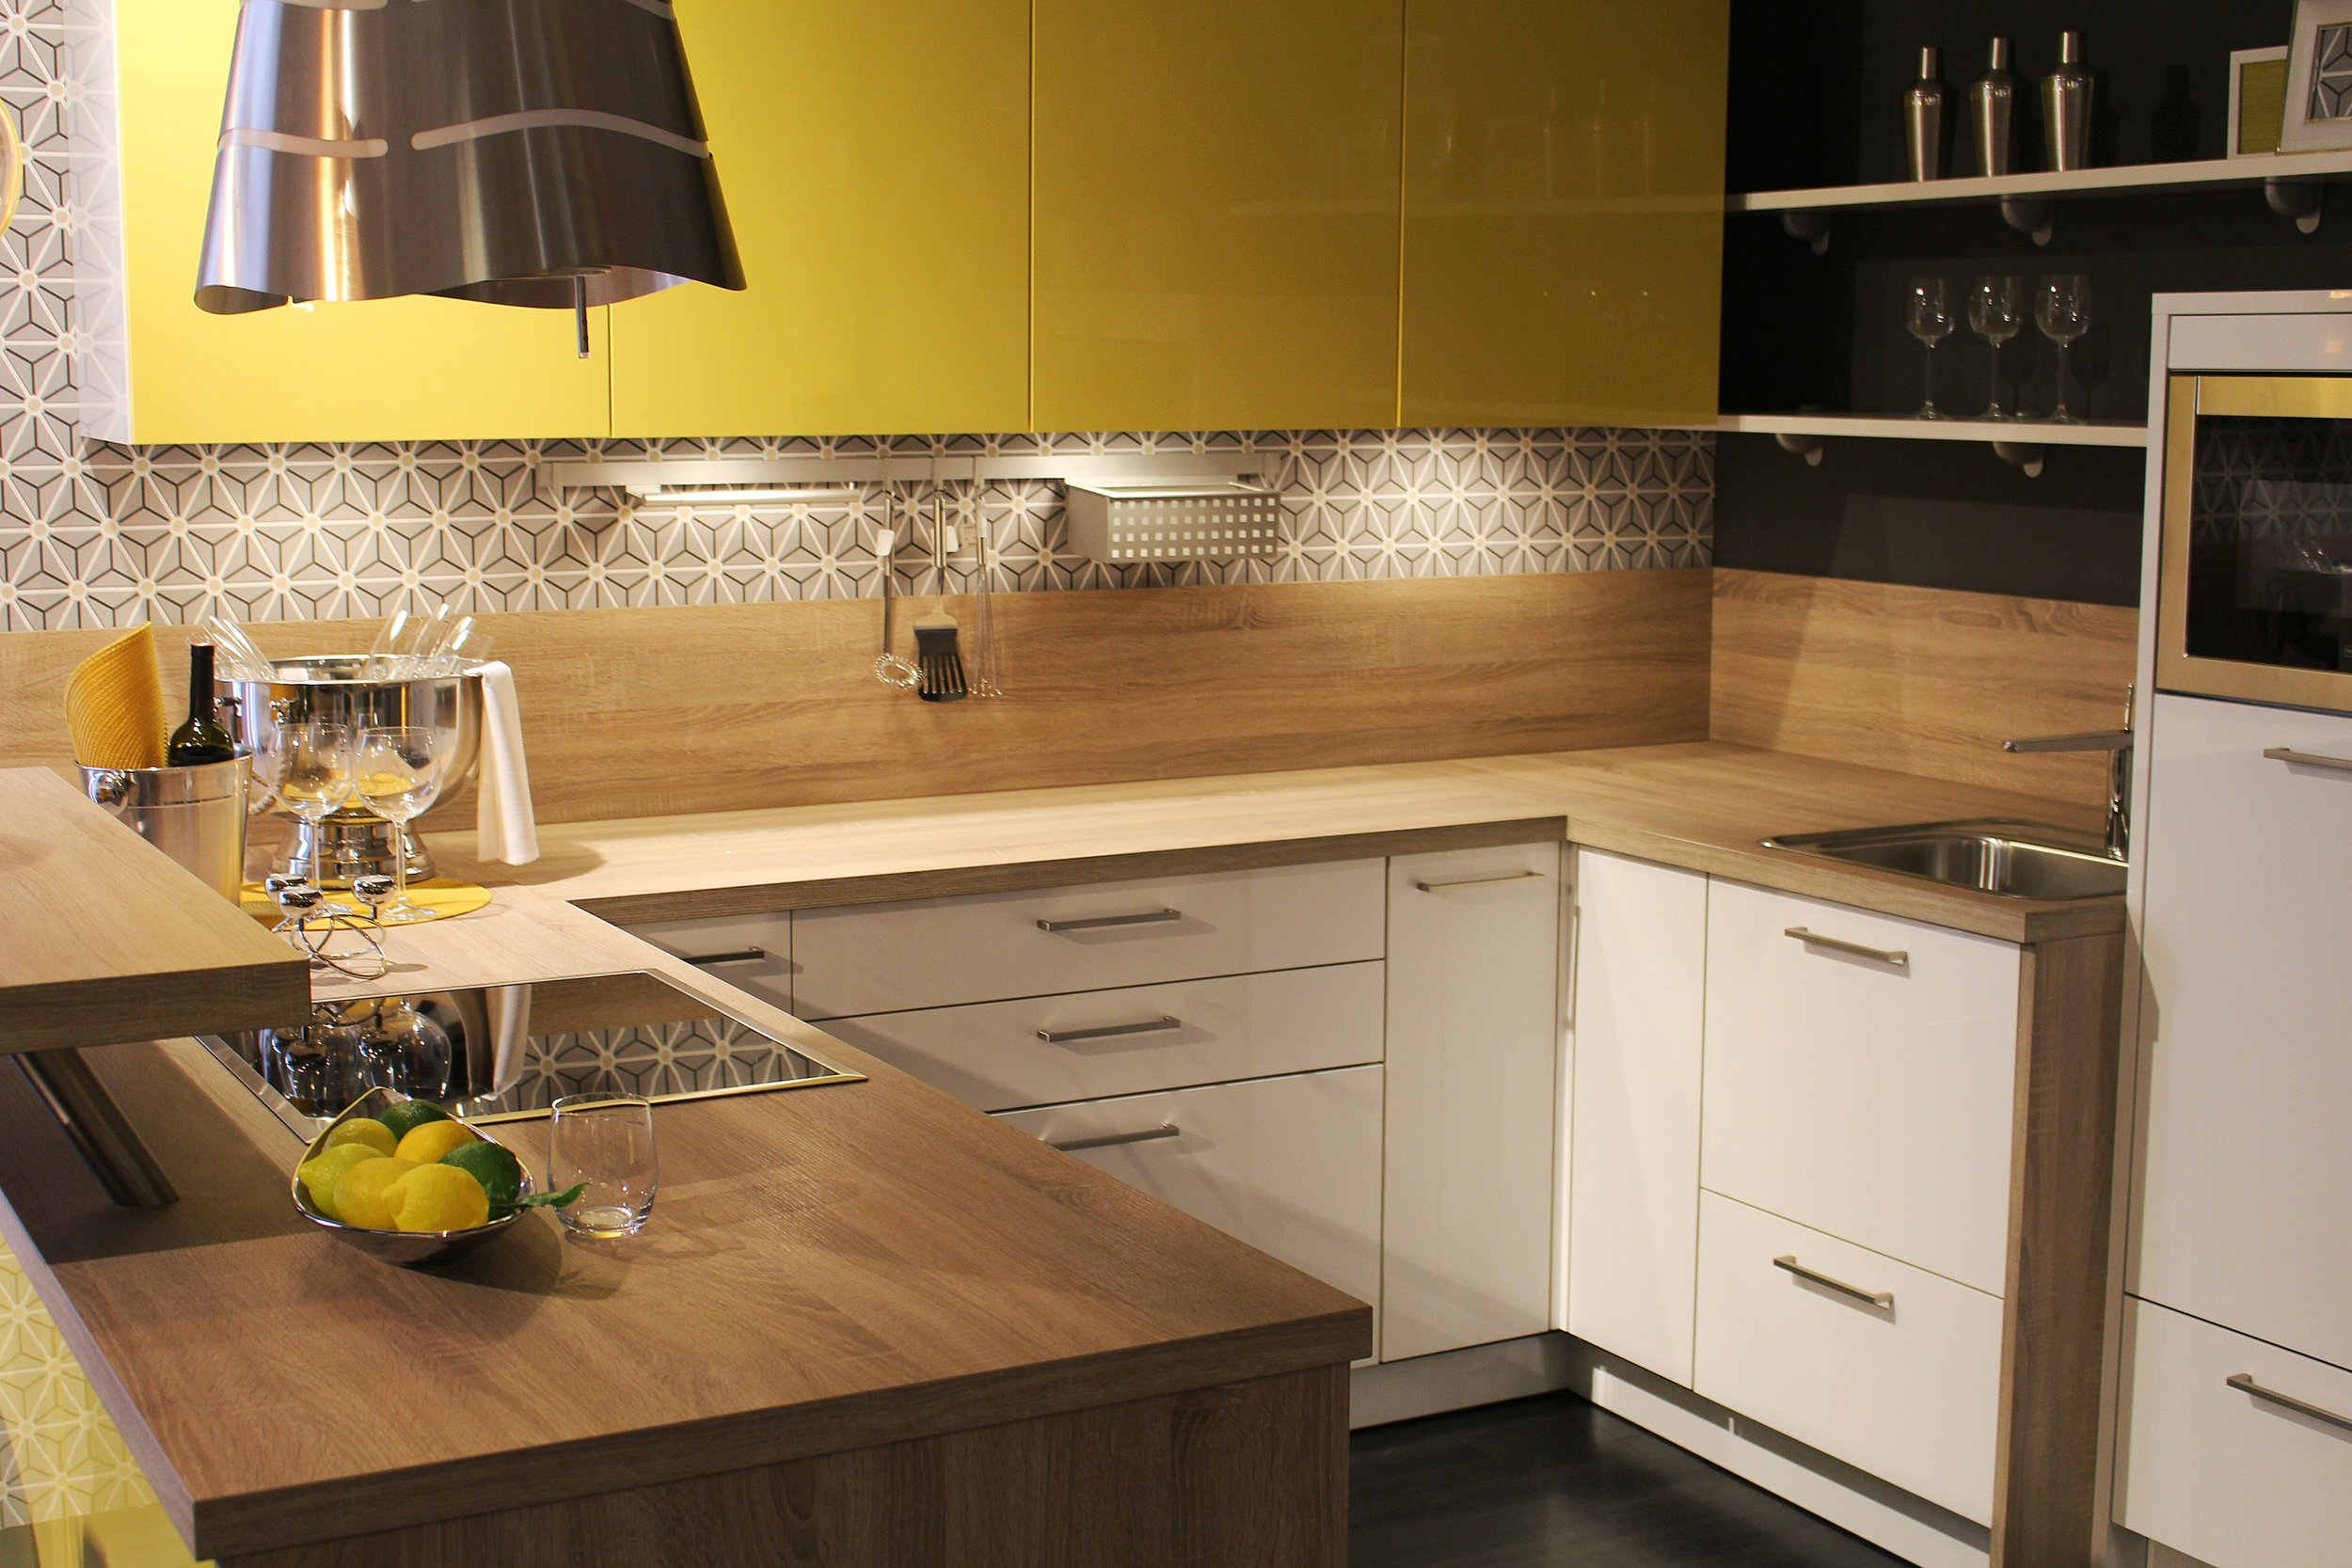 wood-floor-home-decoration-food-cottage-886149-pxhere.com.jpg